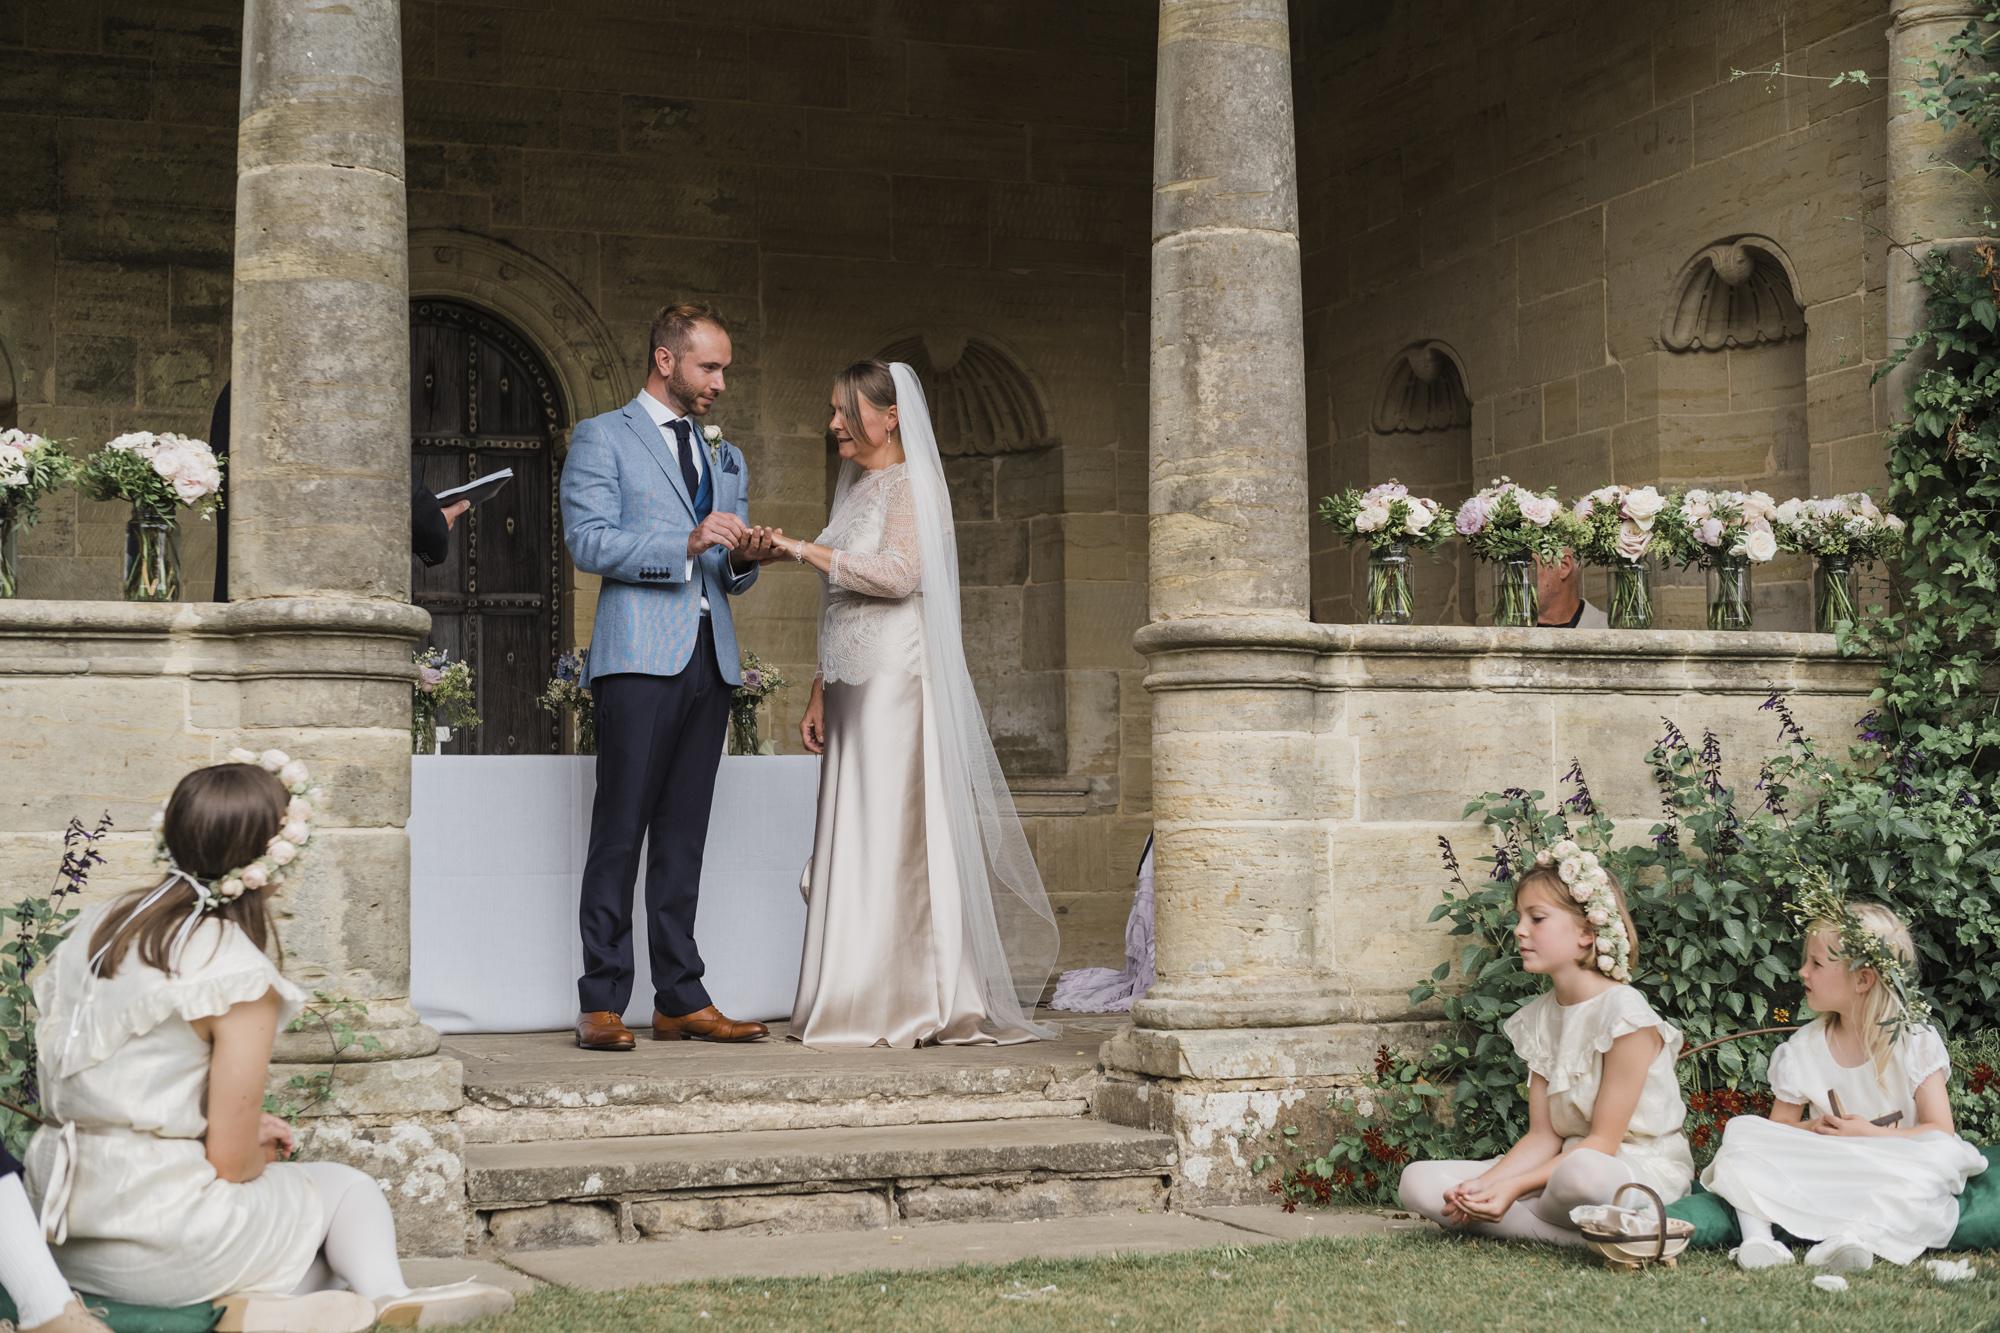 Jaz-Kate-Beaumont-Oyster-Silk-Bias-Cut-Wedding-Gown-Larkspur-Lace-Top-Sussex-Wedding-6.jpg